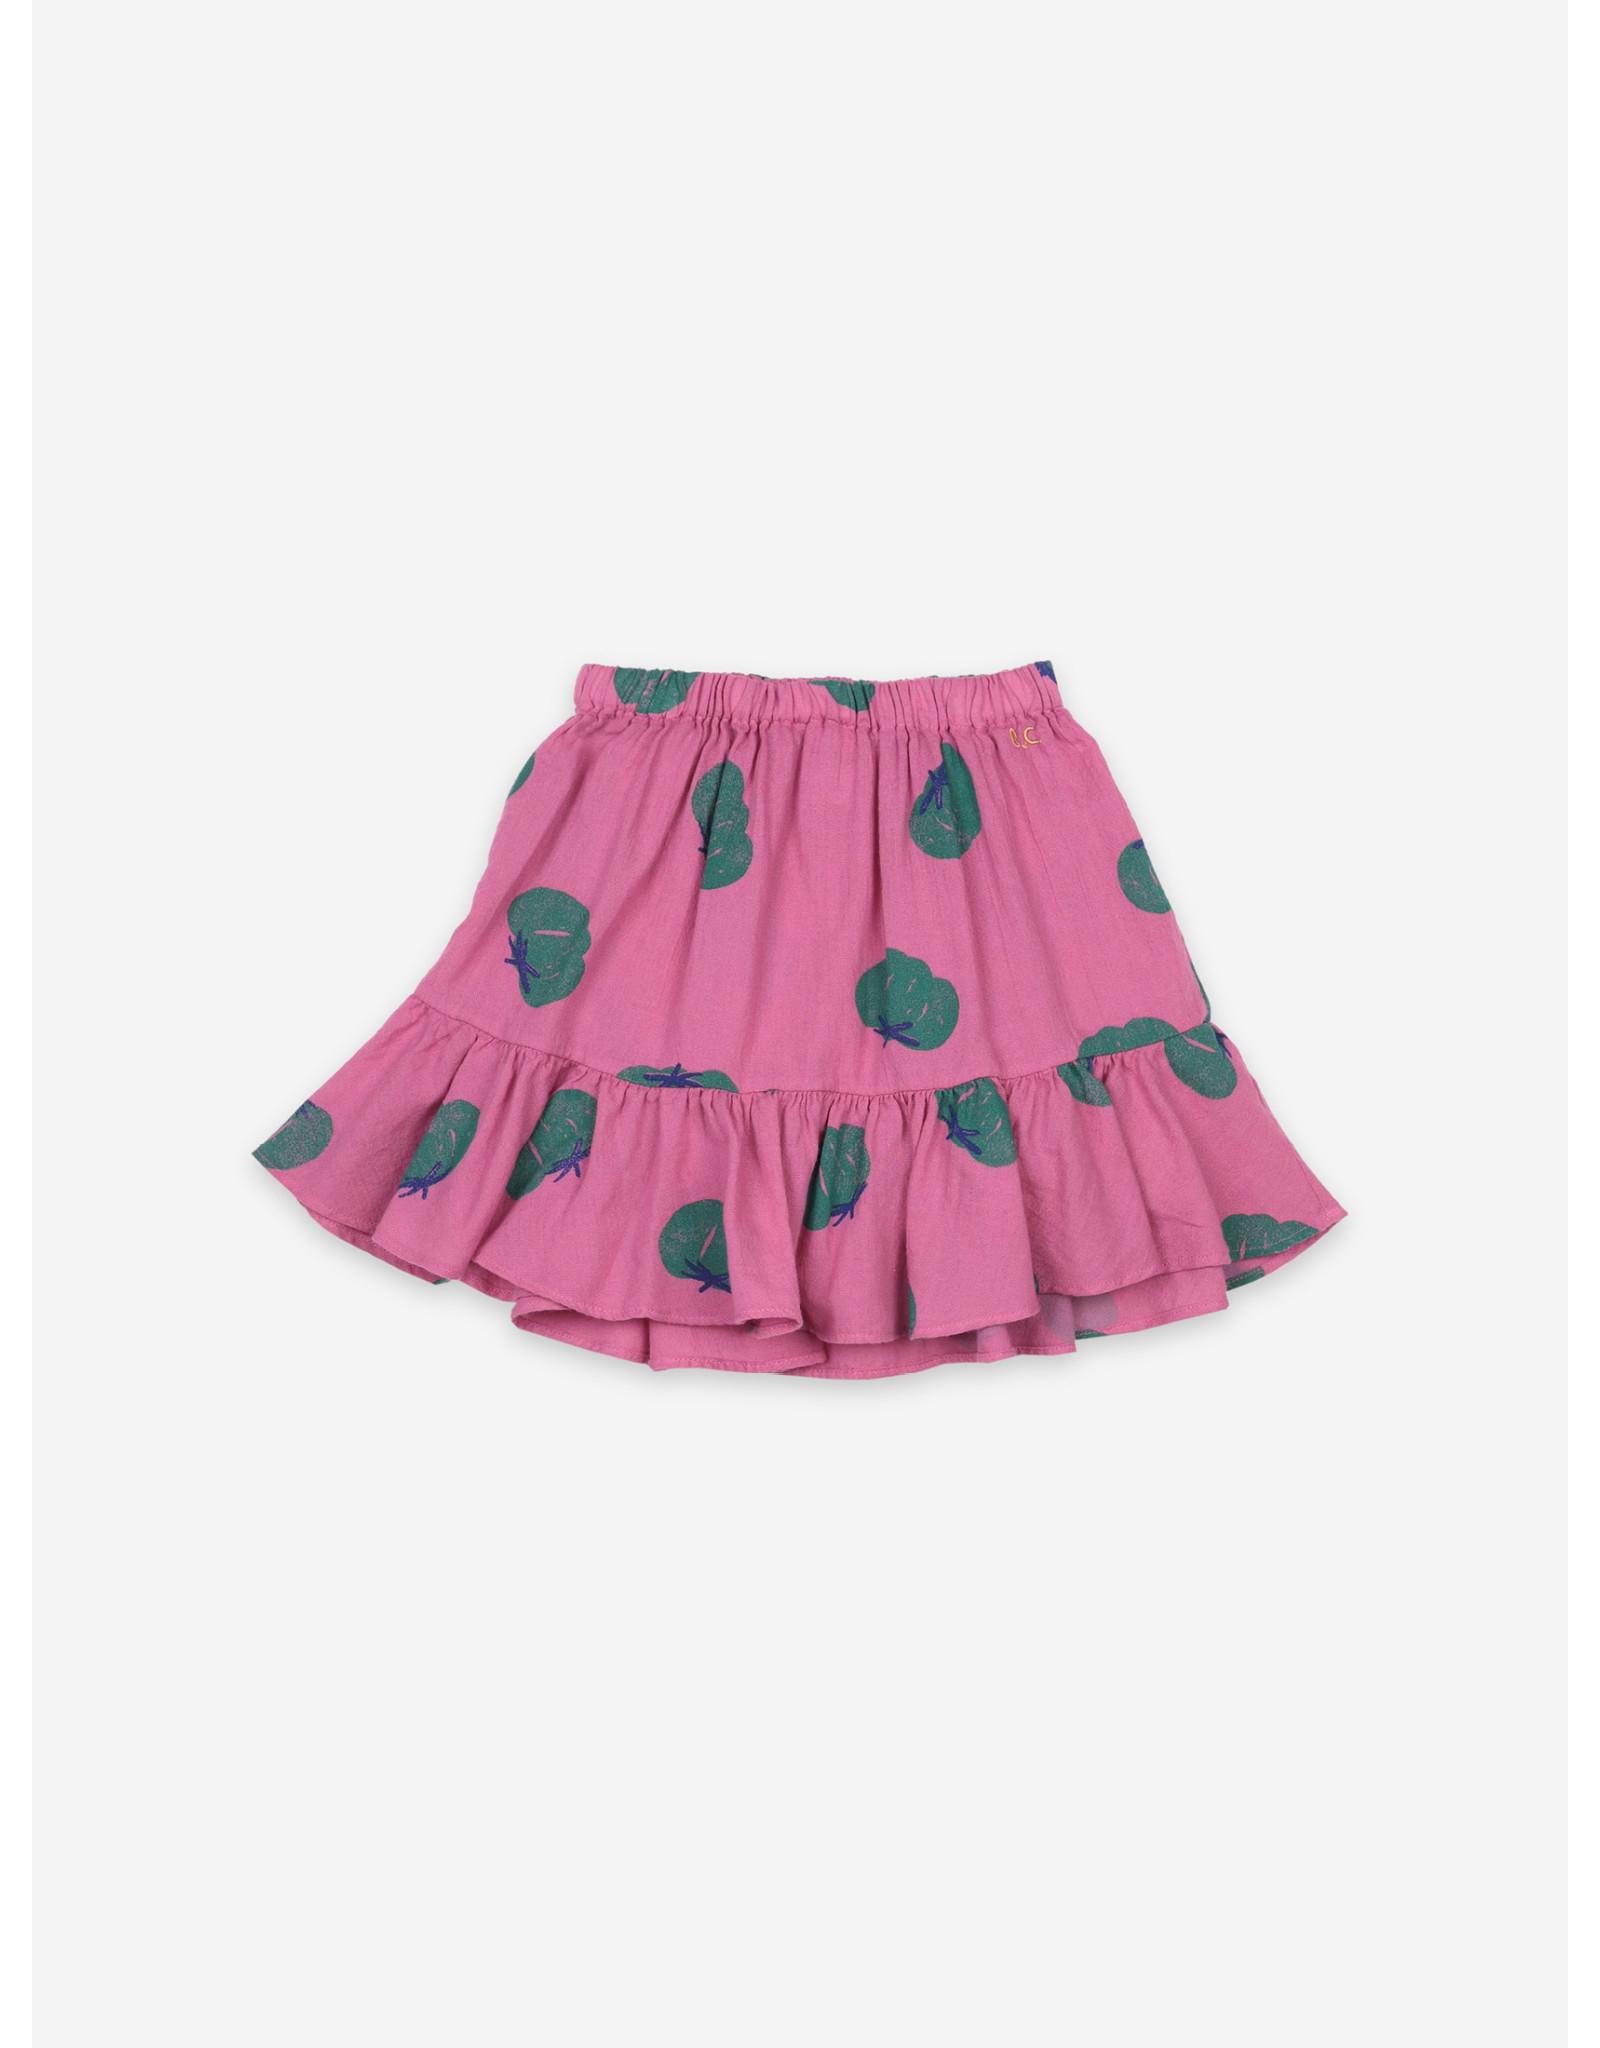 Bobo Choses Tomatoes All Over Ruffle Mini Skirt